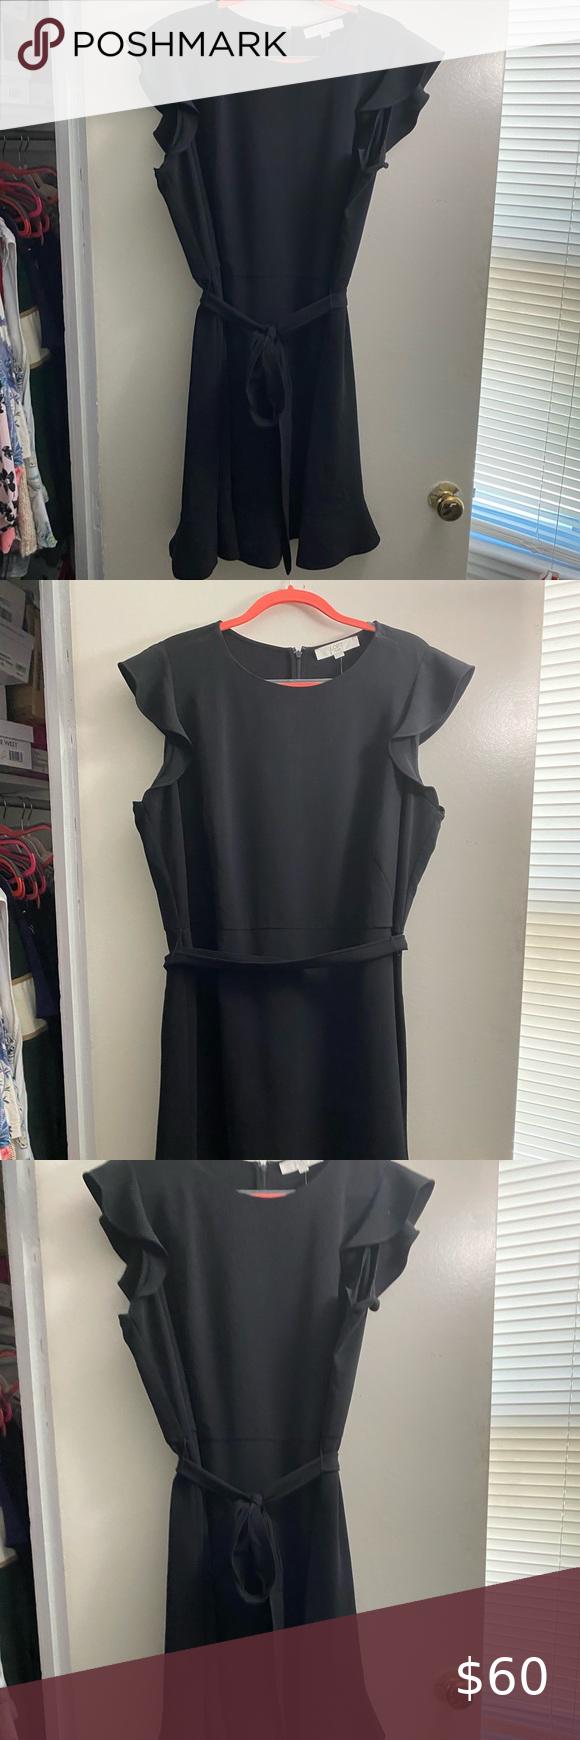 Nwt Loft Black Flutter Sleeve Dress Size 18 Flutter Sleeve Dress Dresses With Sleeves Clothes Design [ 1740 x 580 Pixel ]